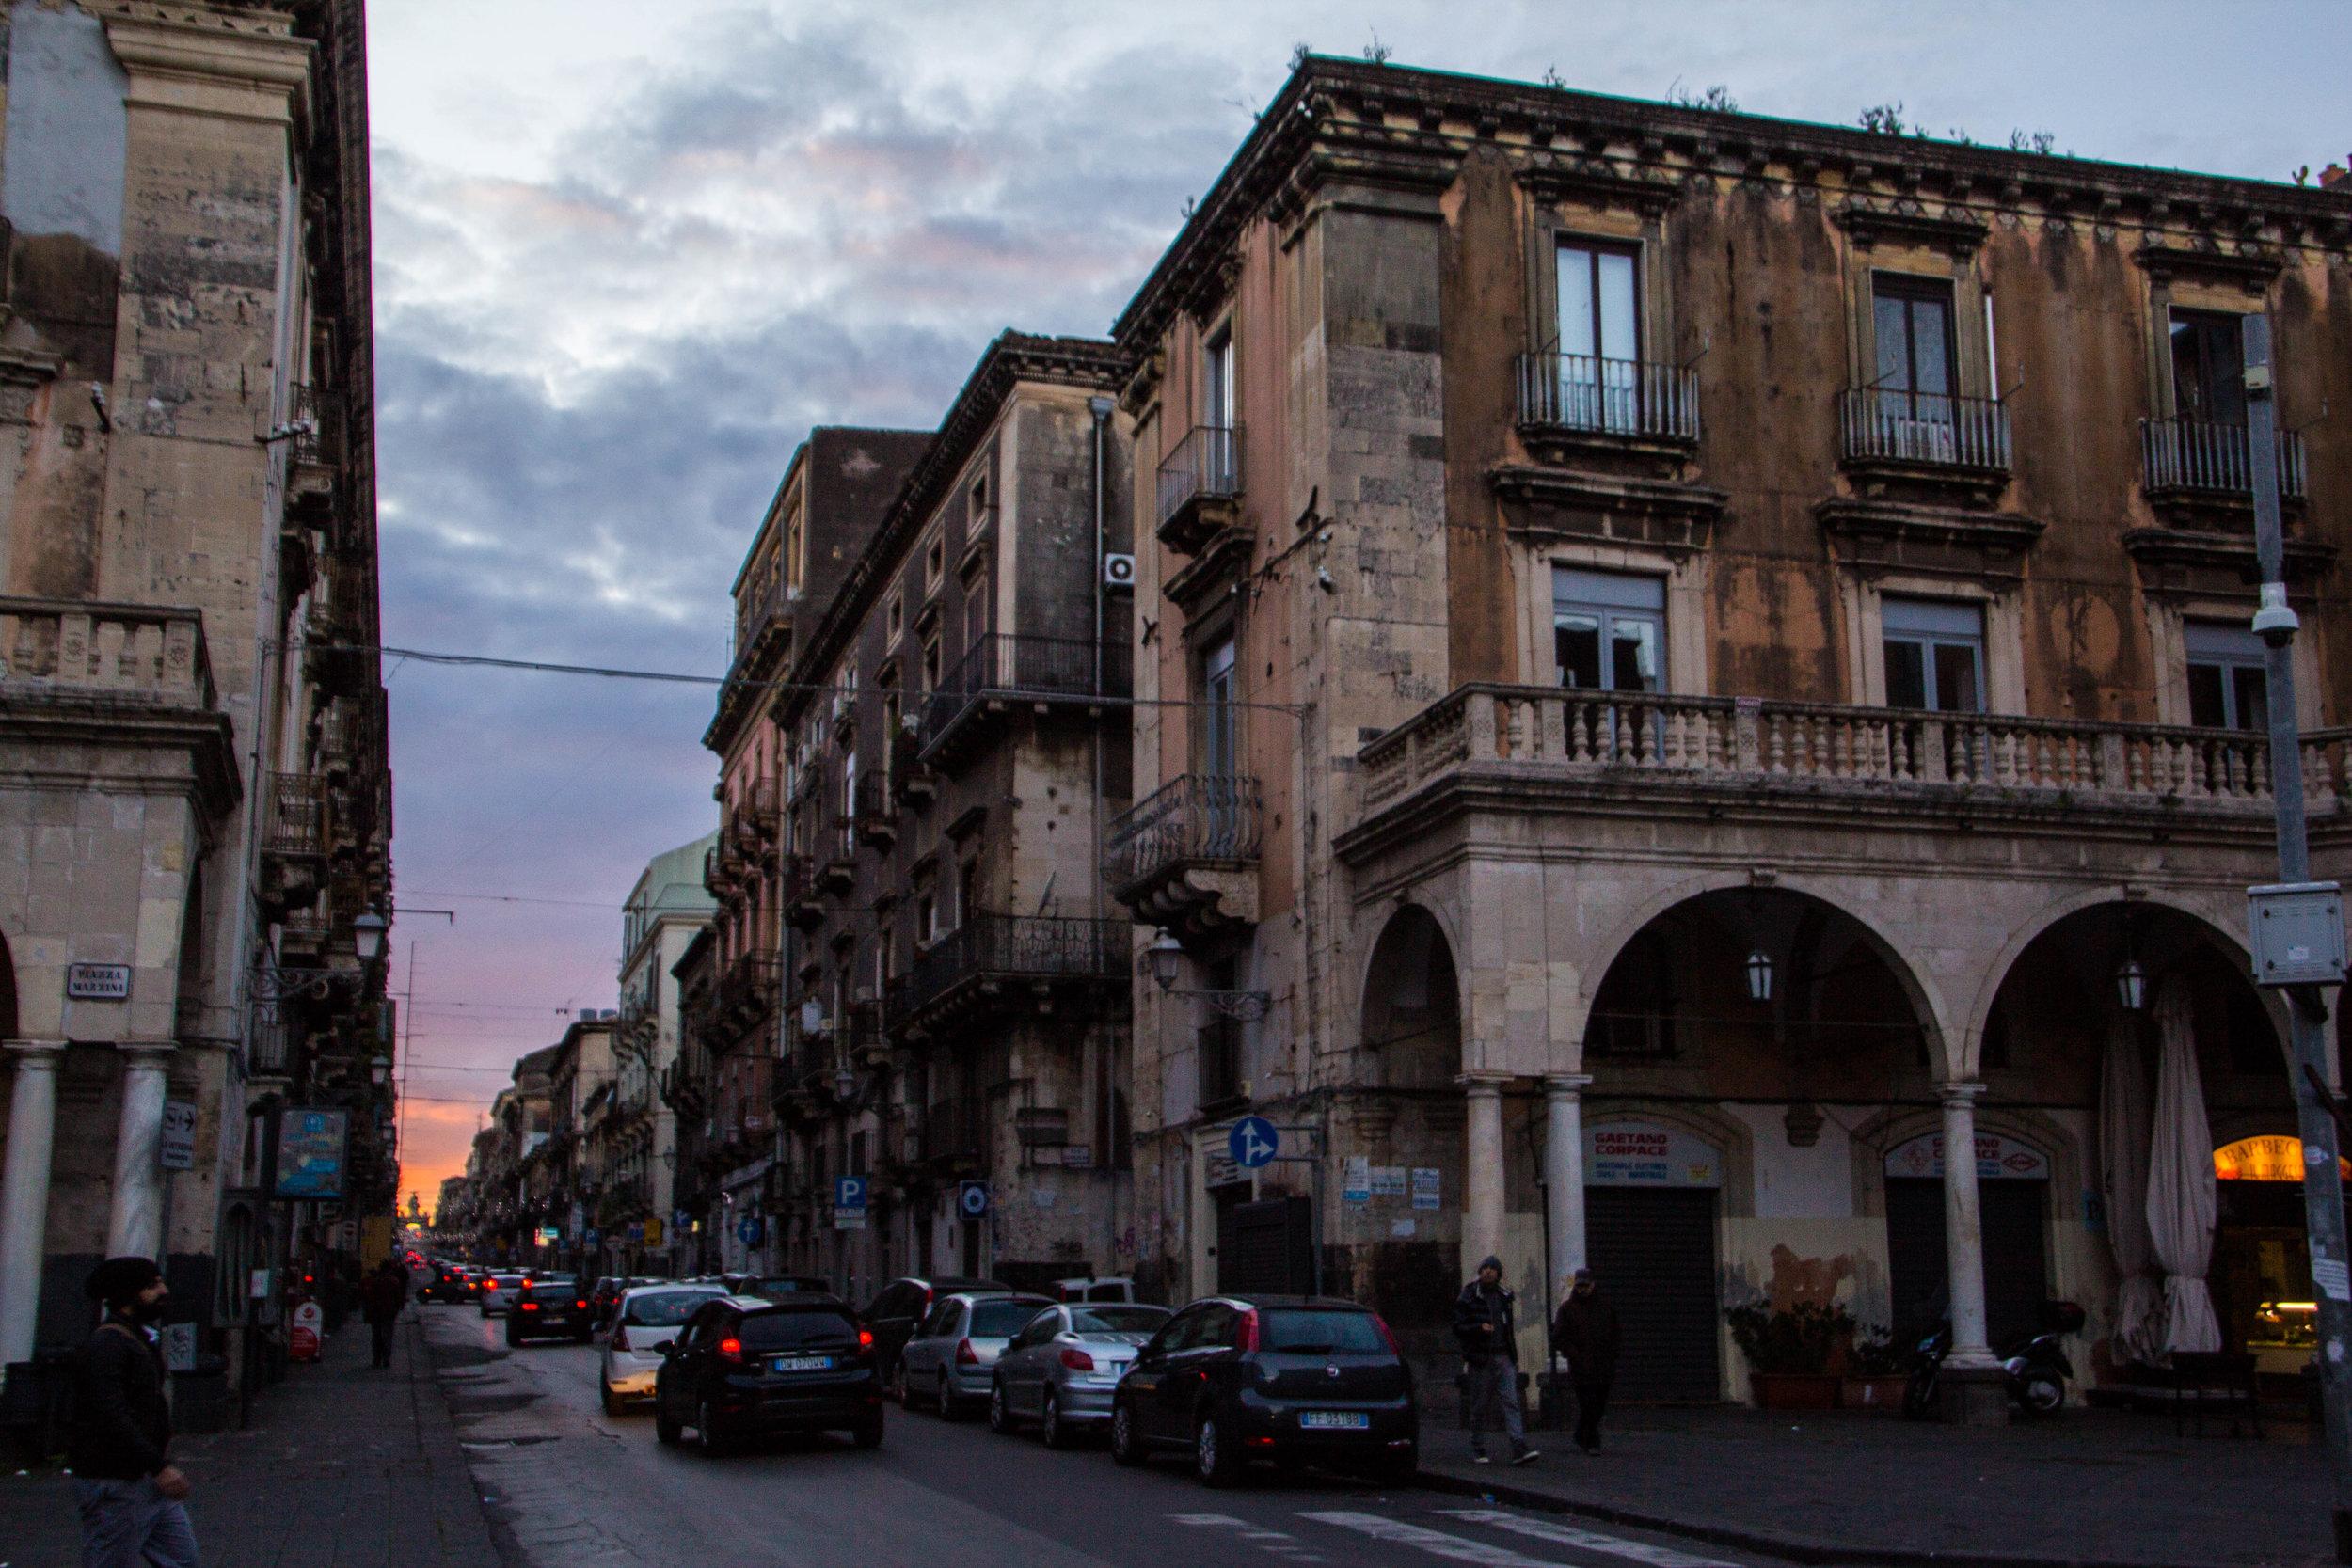 streets-catania-sicily-sicilia-31.jpg